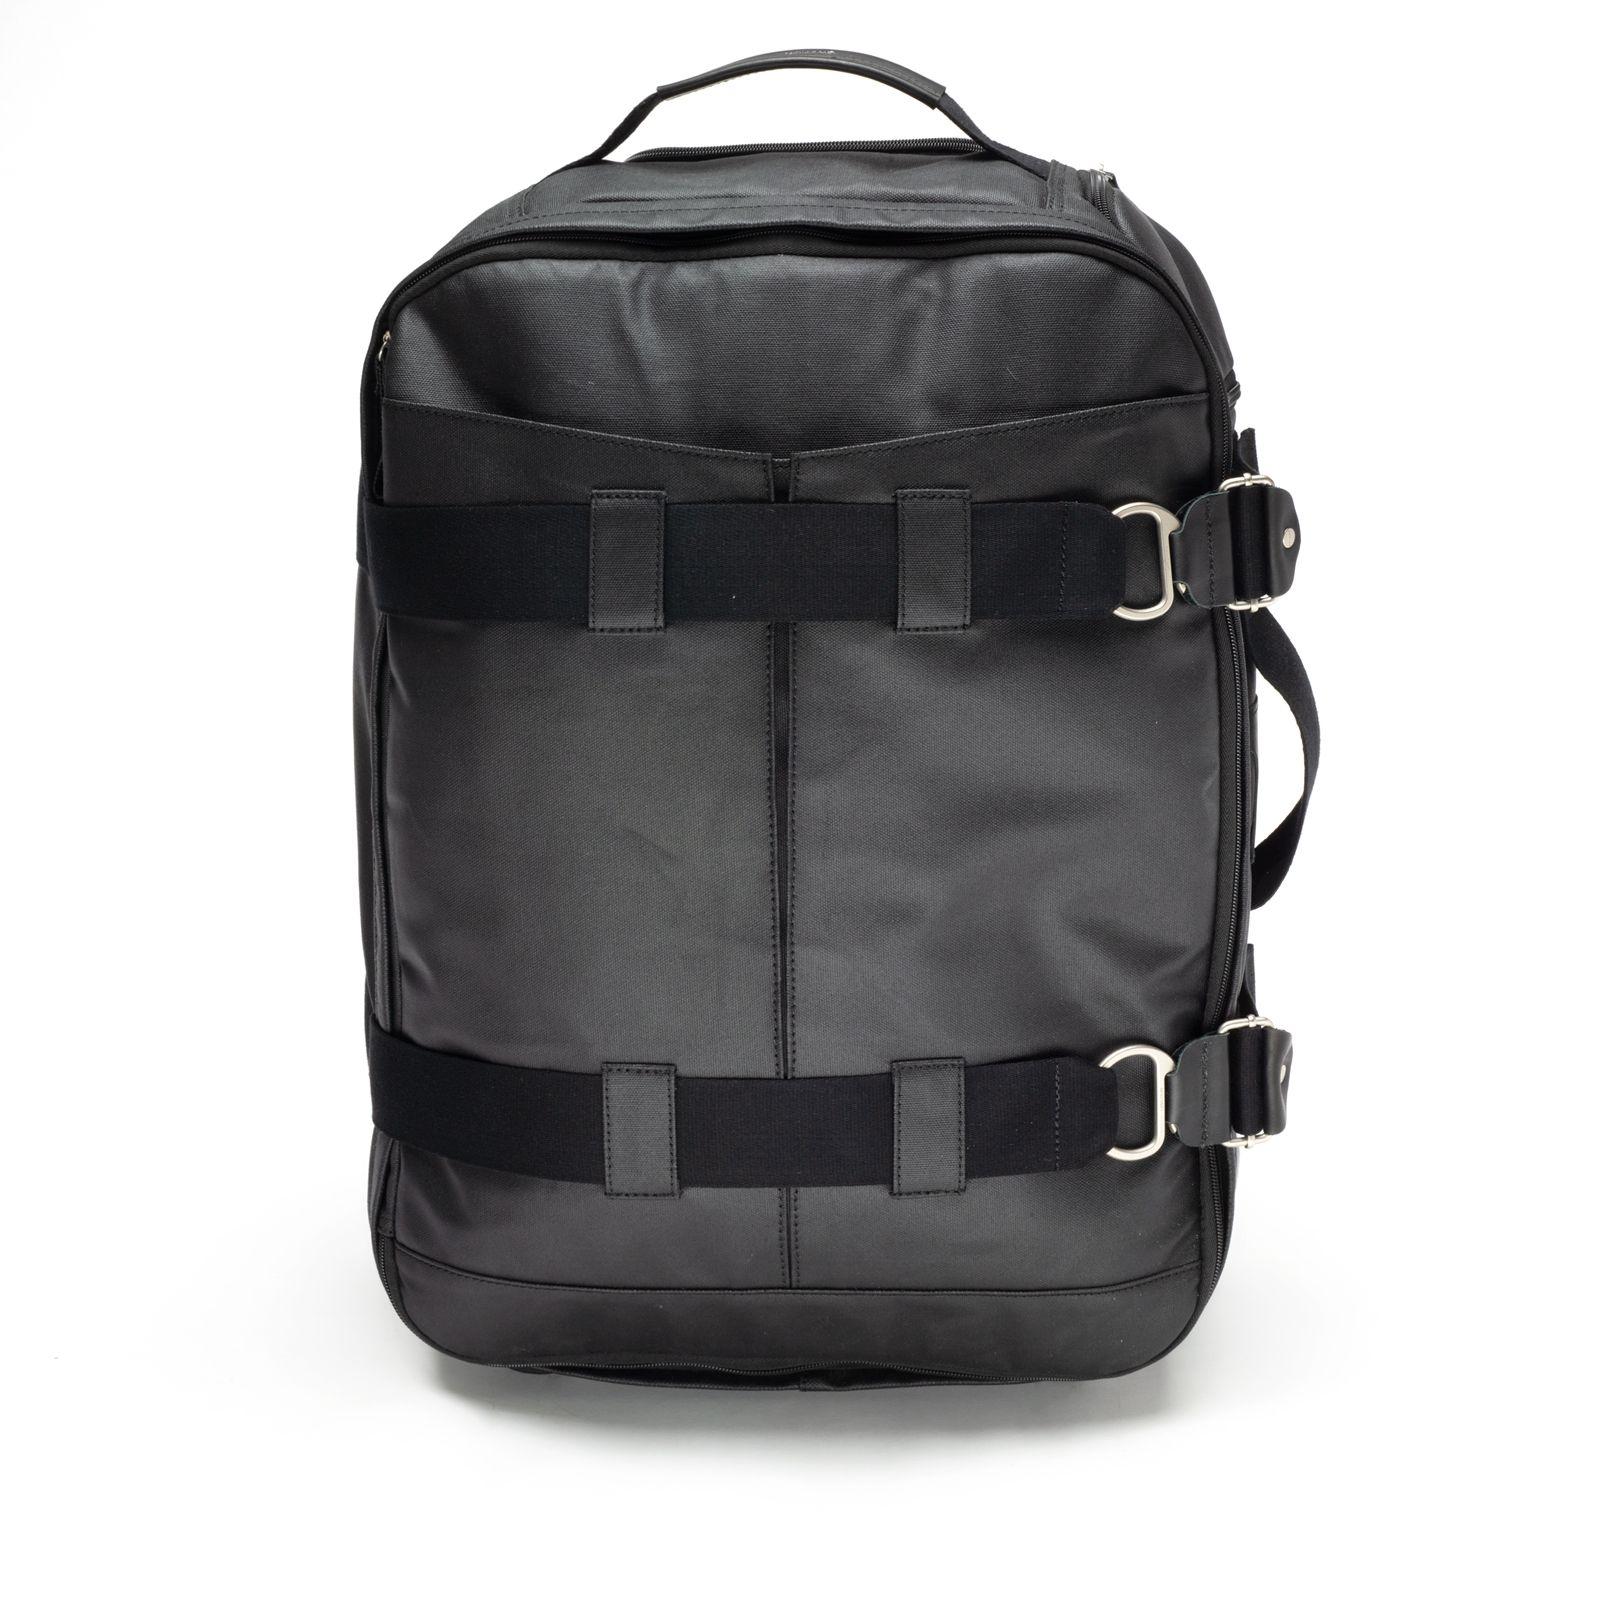 3-Day Travel Bag - Organic Jet Black